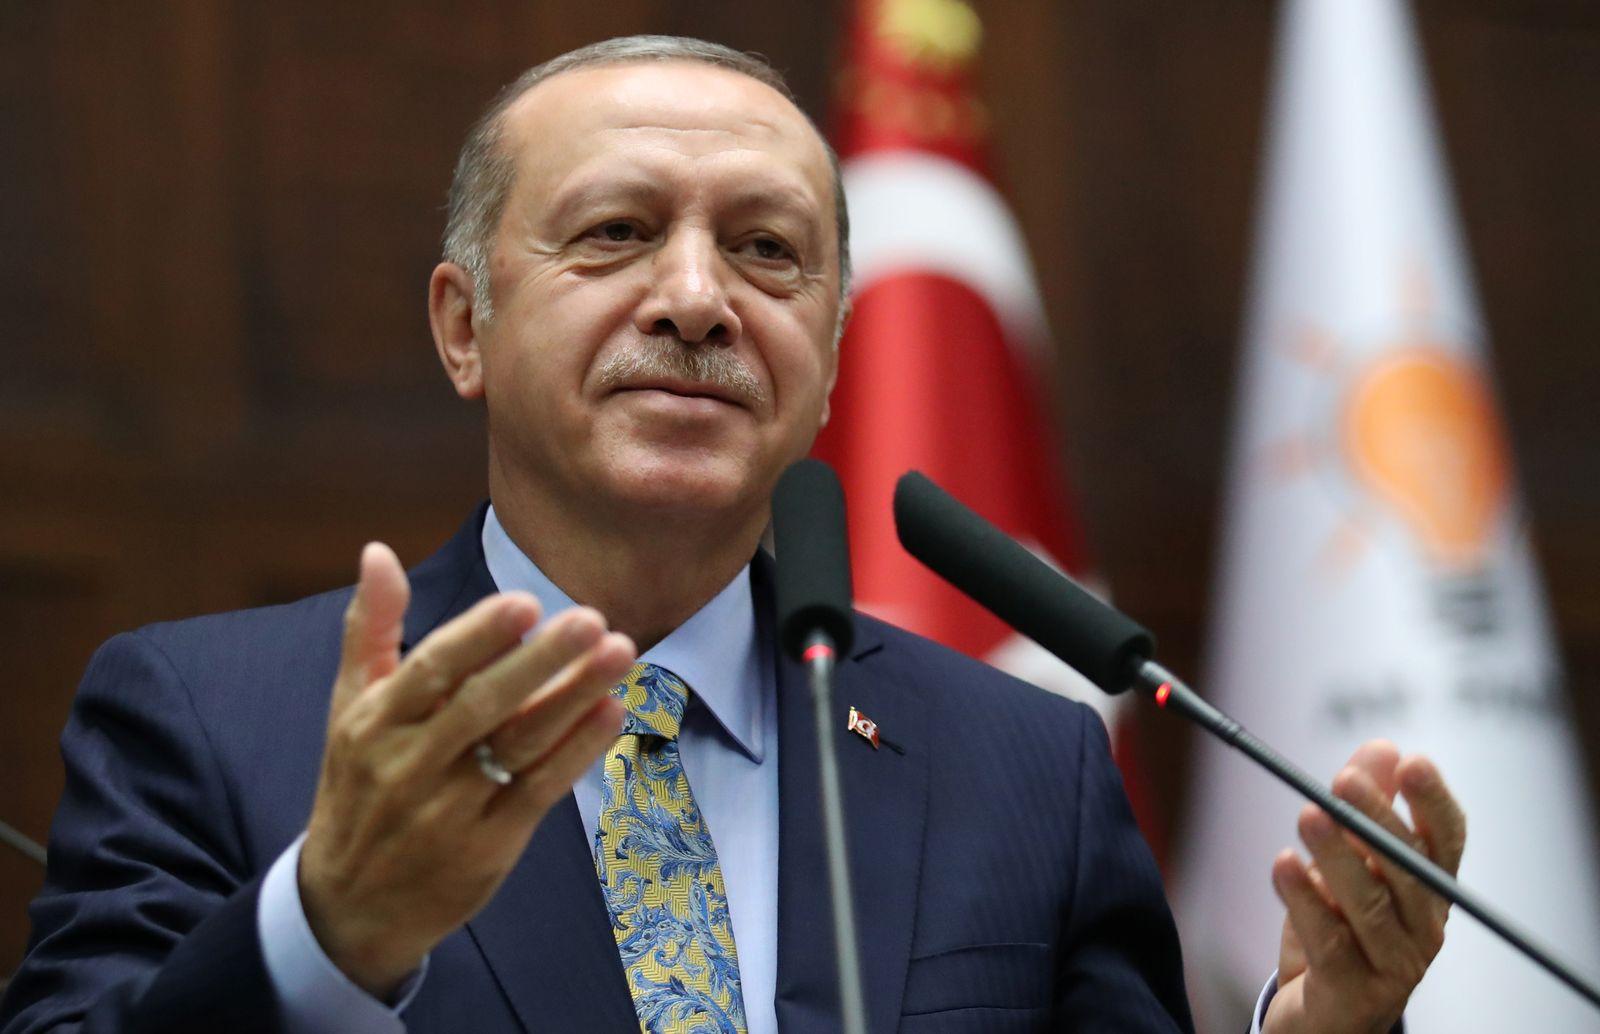 Tayyip Erdogan/ Saudi Arabien/ Jamal Khashoggi